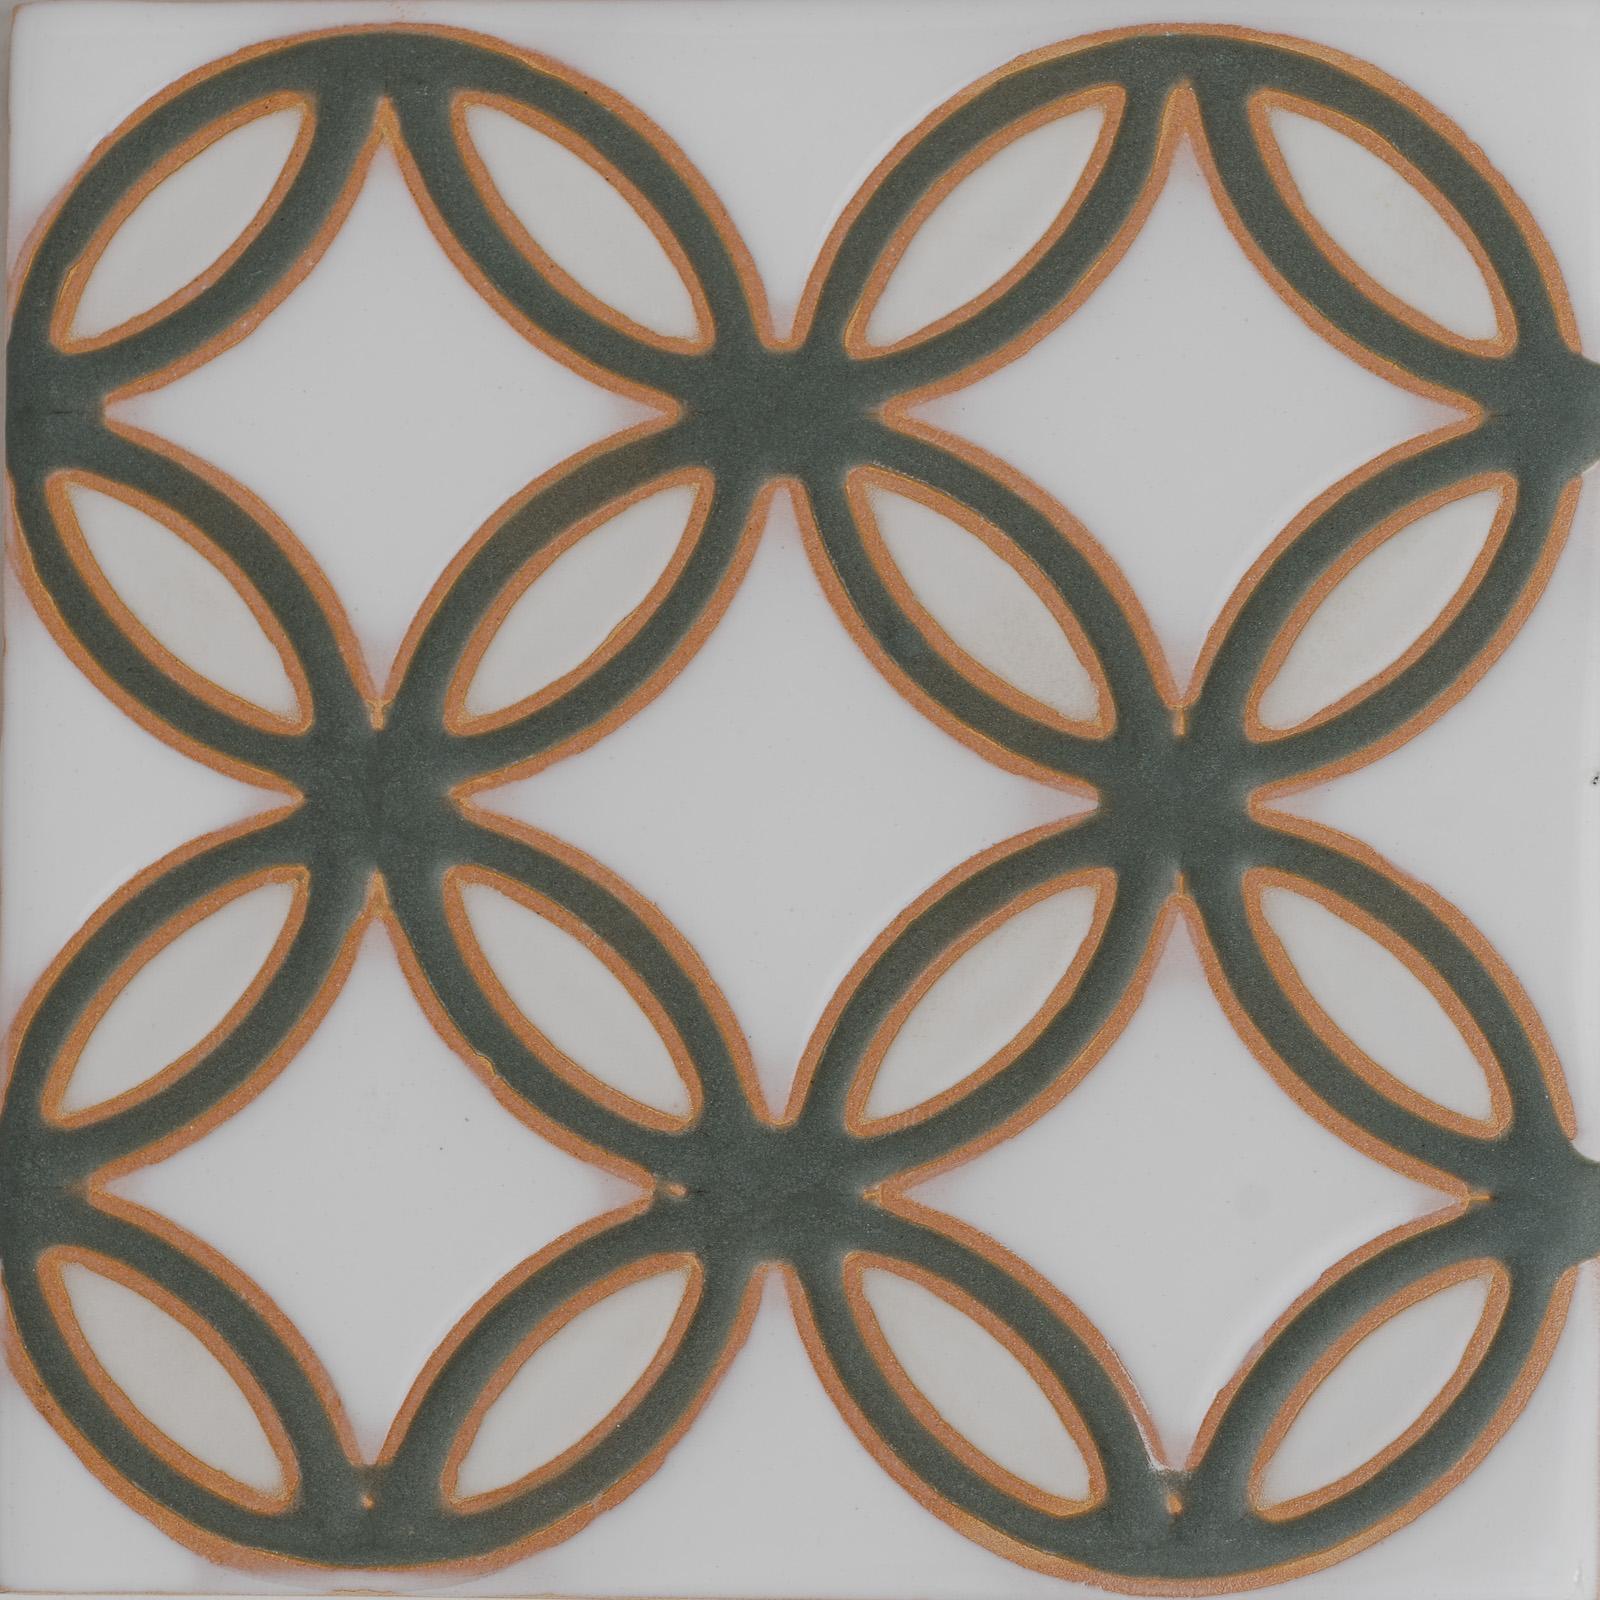 Coastal collection cs13 emma wanless coastal collection cs13 our ceramic coastal high relief tile dailygadgetfo Images